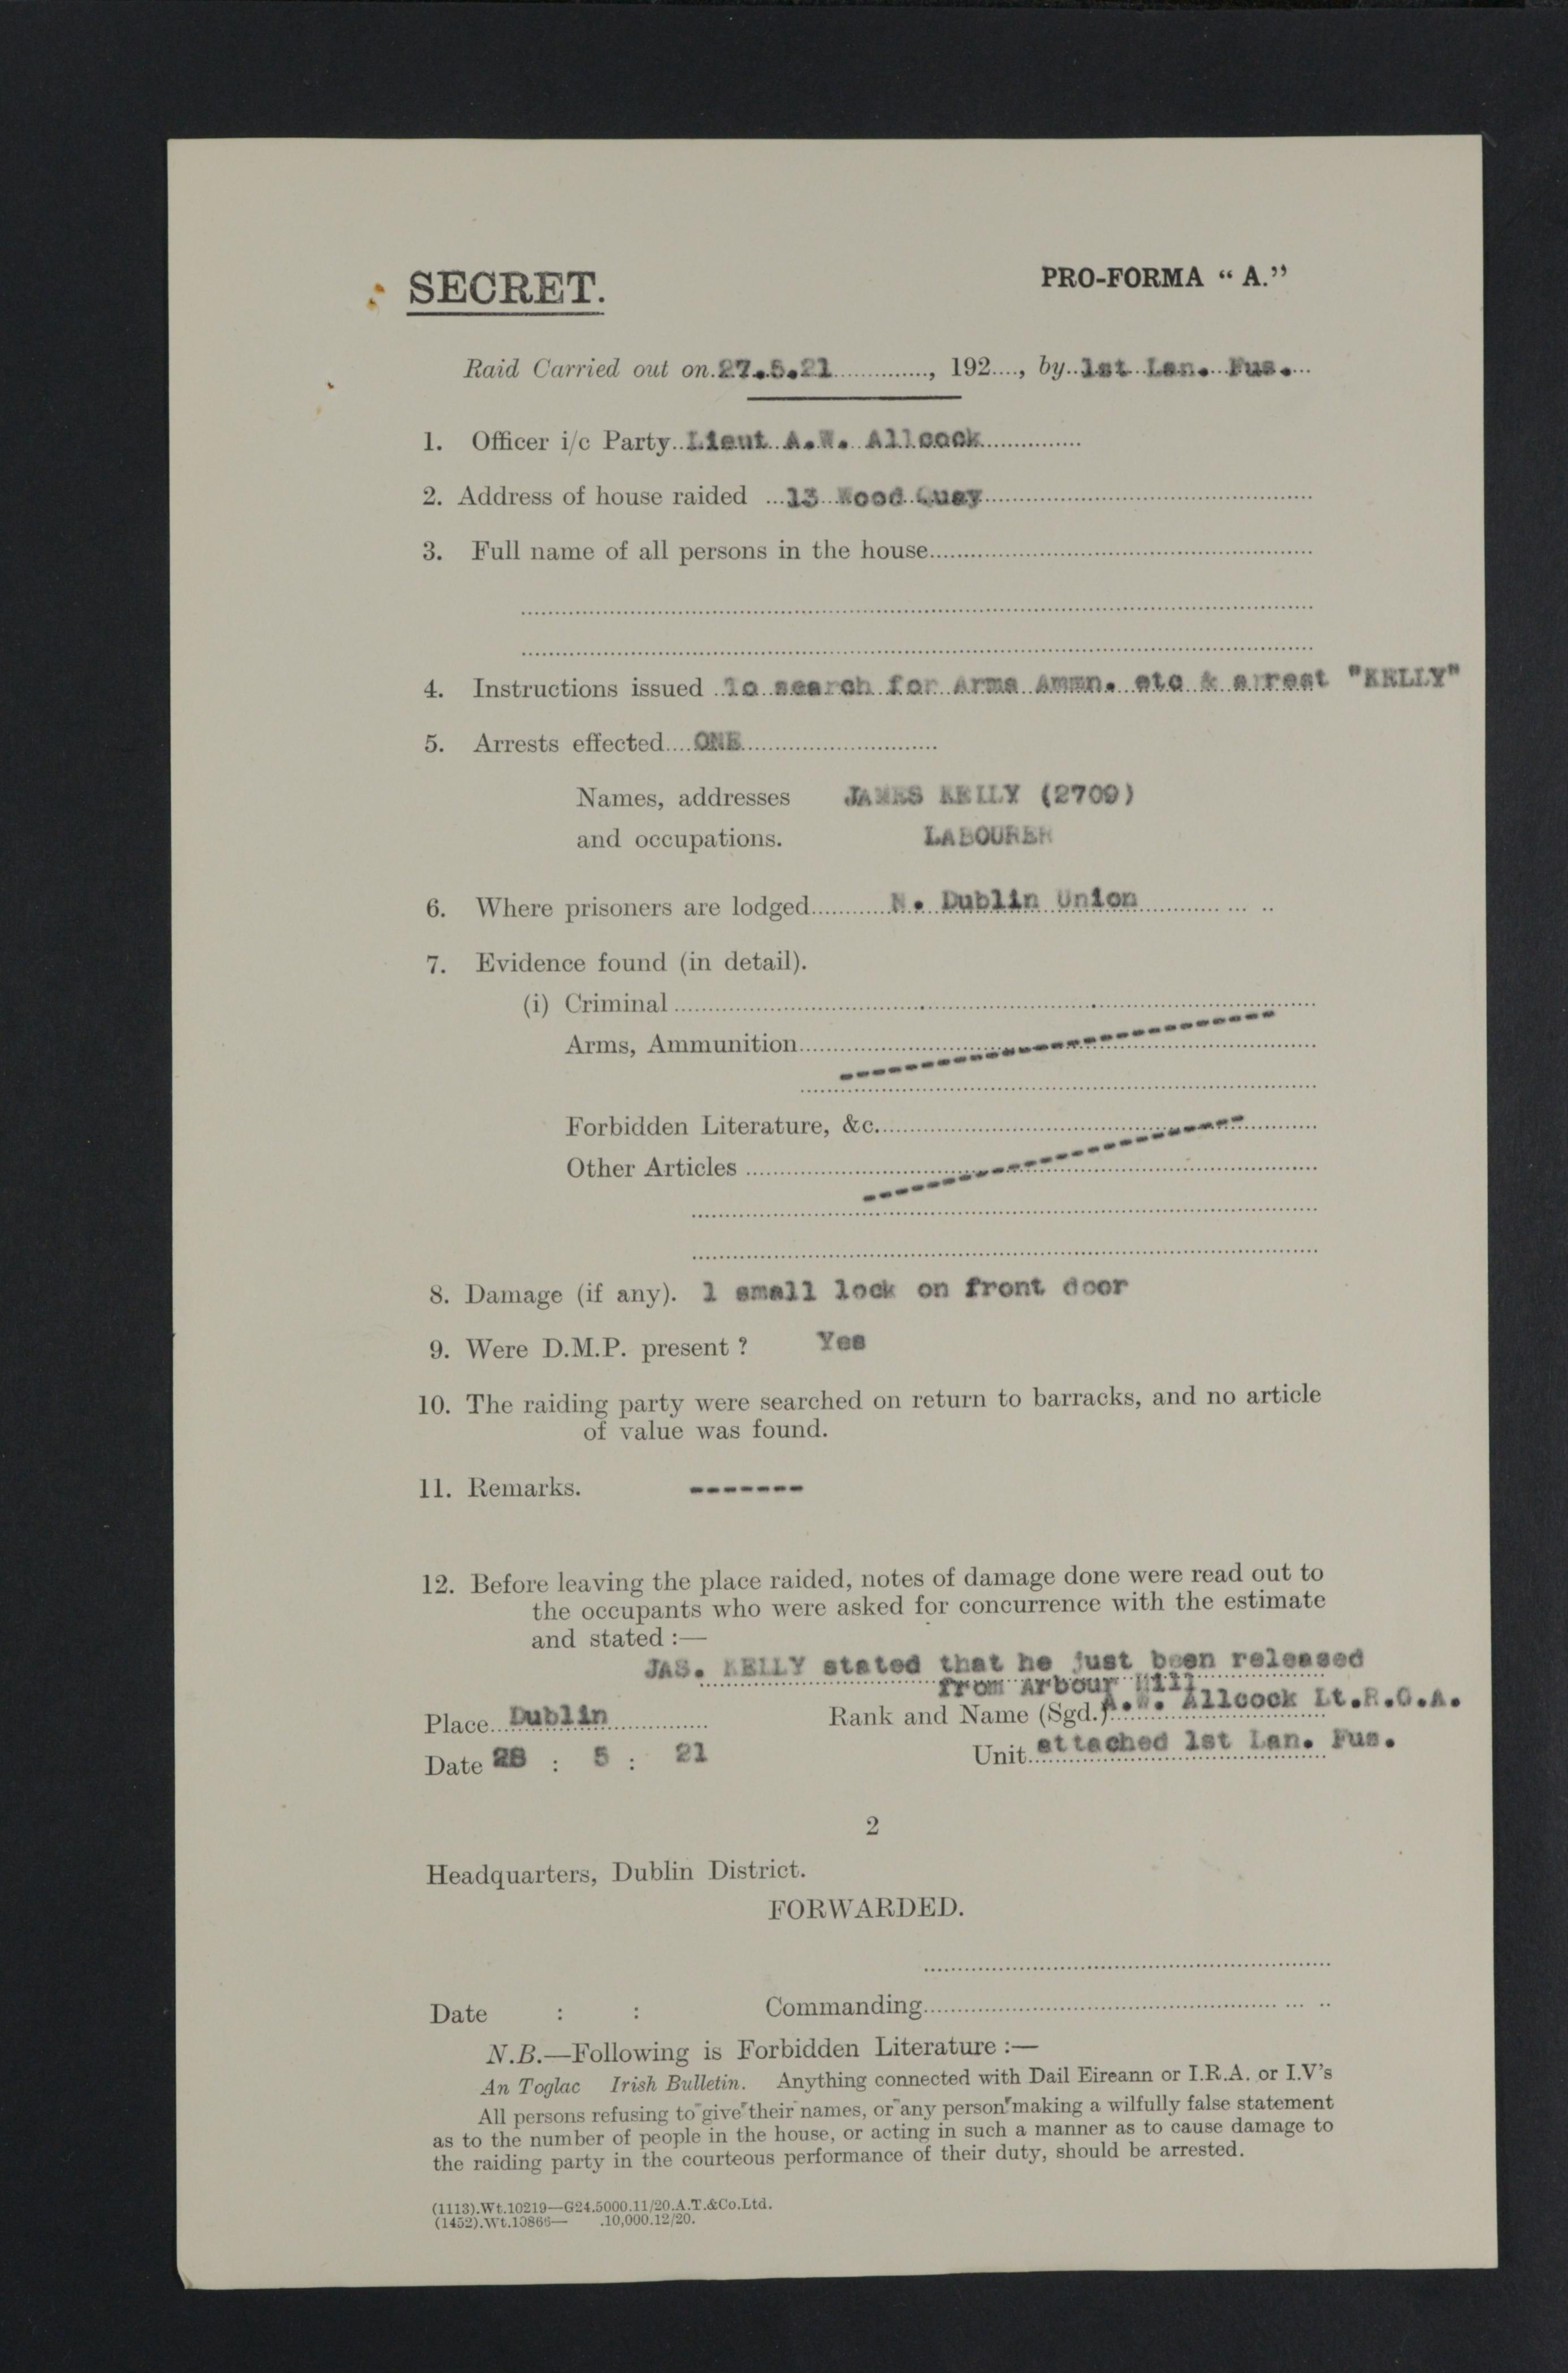 james-kelly-ire-wo35-85-00530 Burning of Dublin Custom House 1921